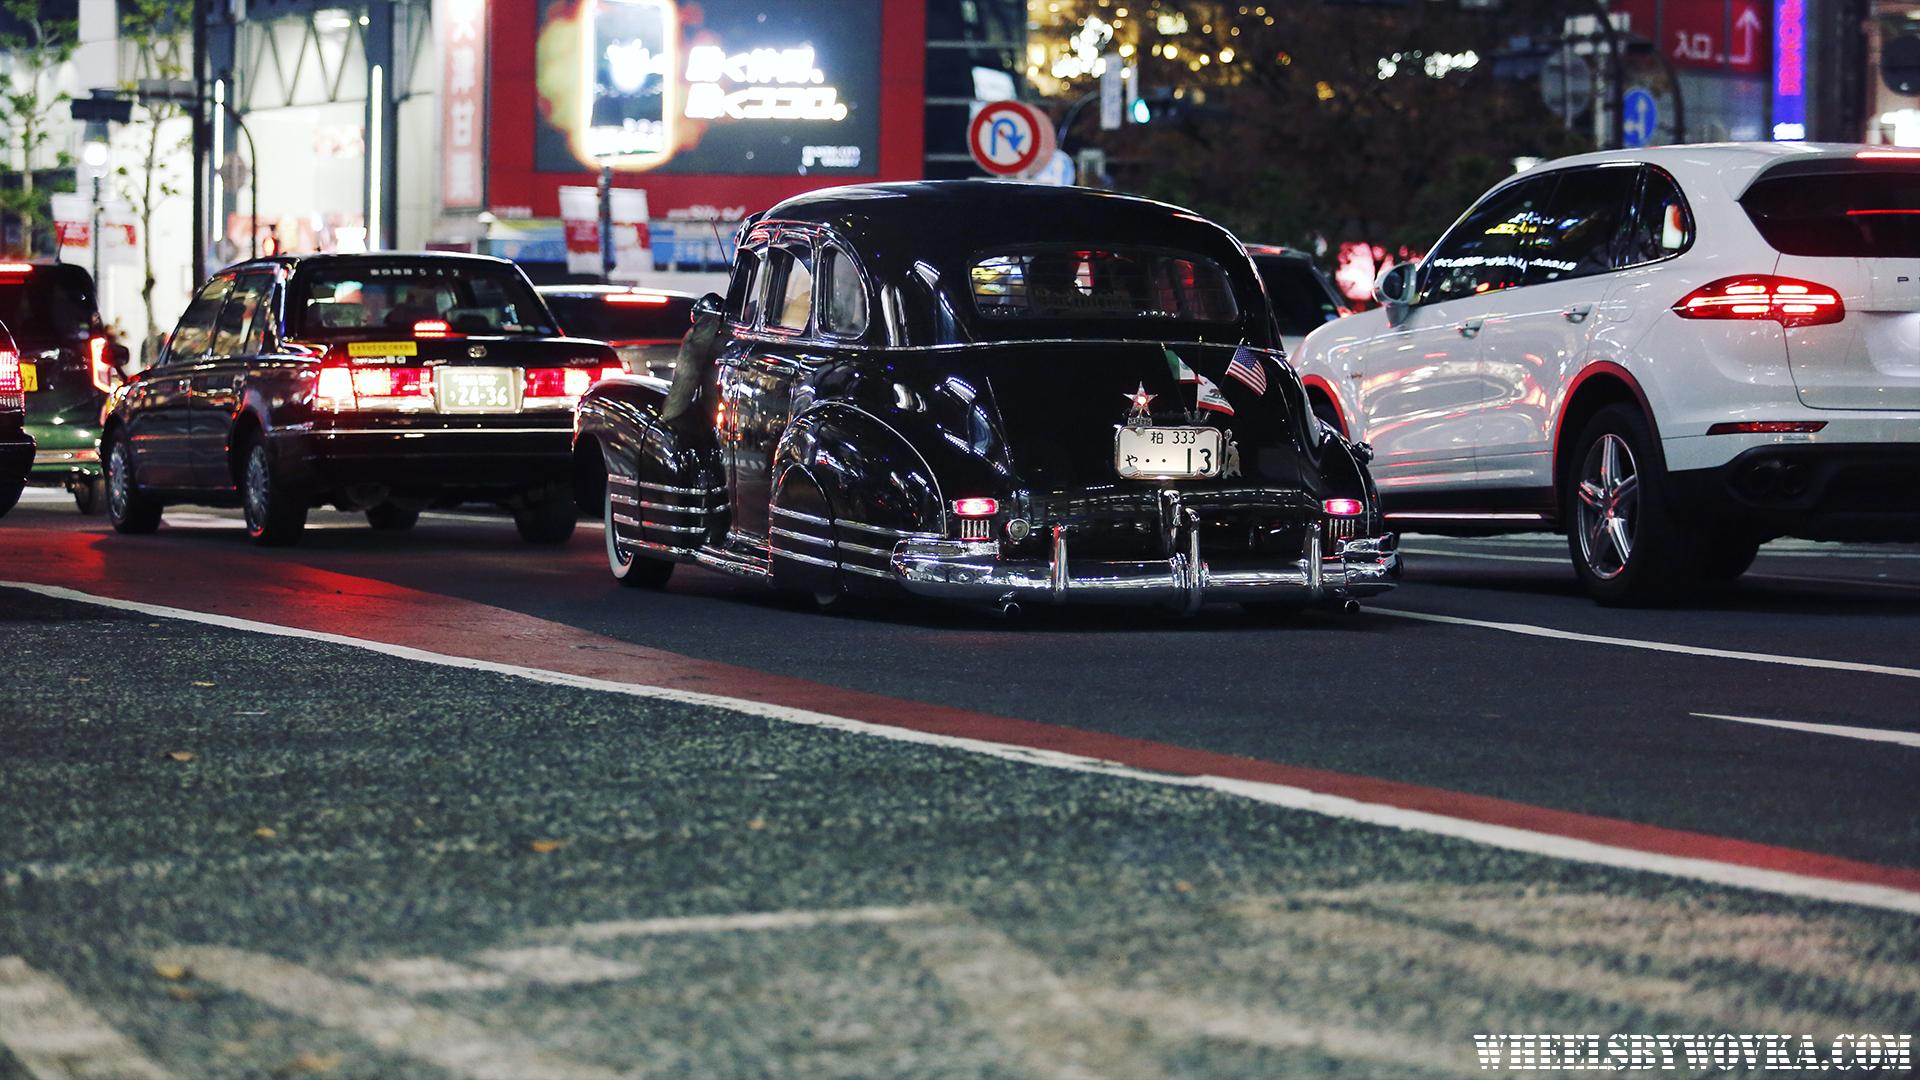 shibuya-japan-tokyo-lowrider-cruise-night-1